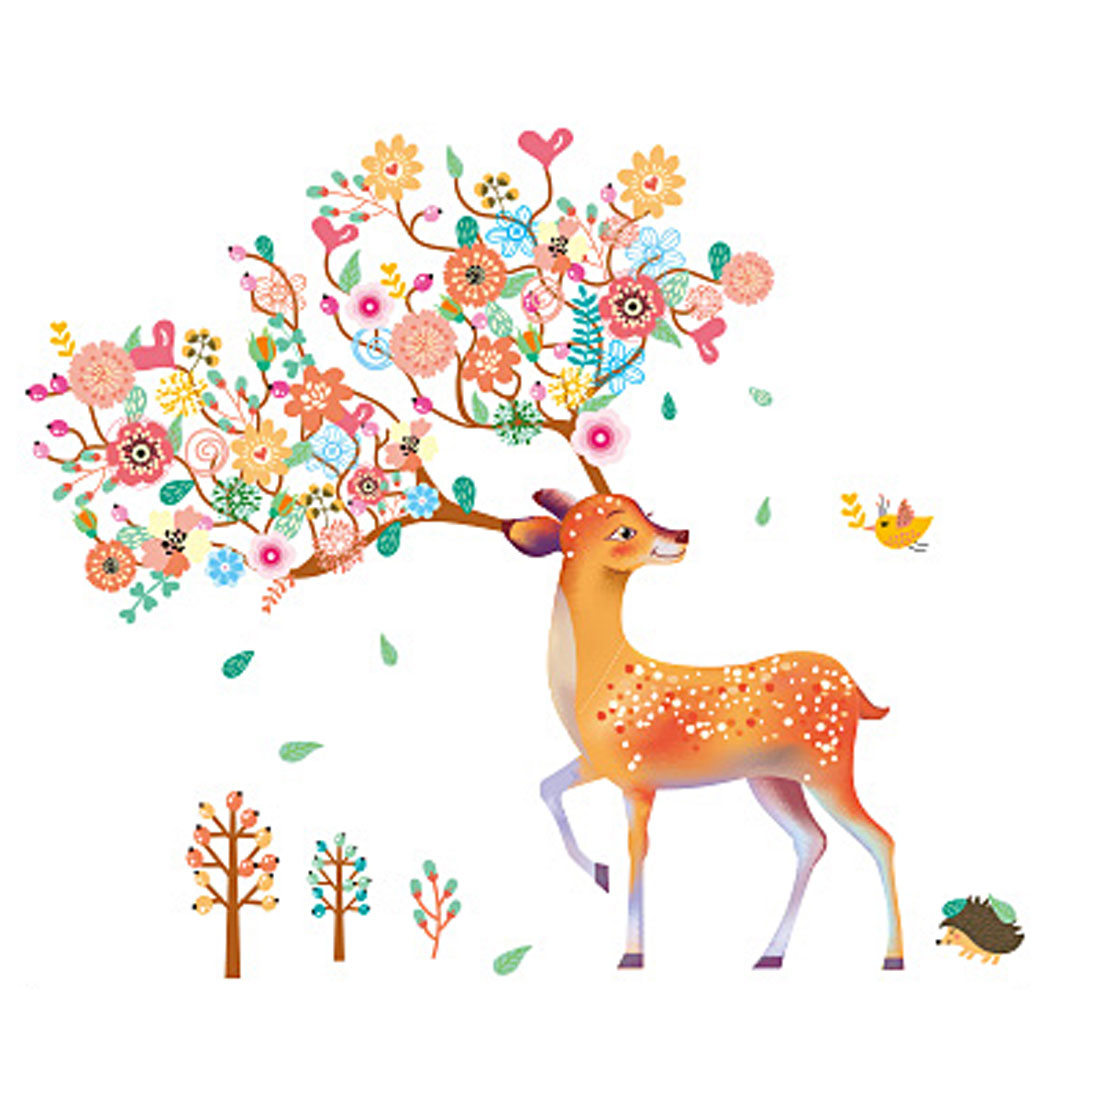 Room PVC Deer Pattern Self-adhesive Window Film Wall Sticker Decal Multicolor - image 3 of 3